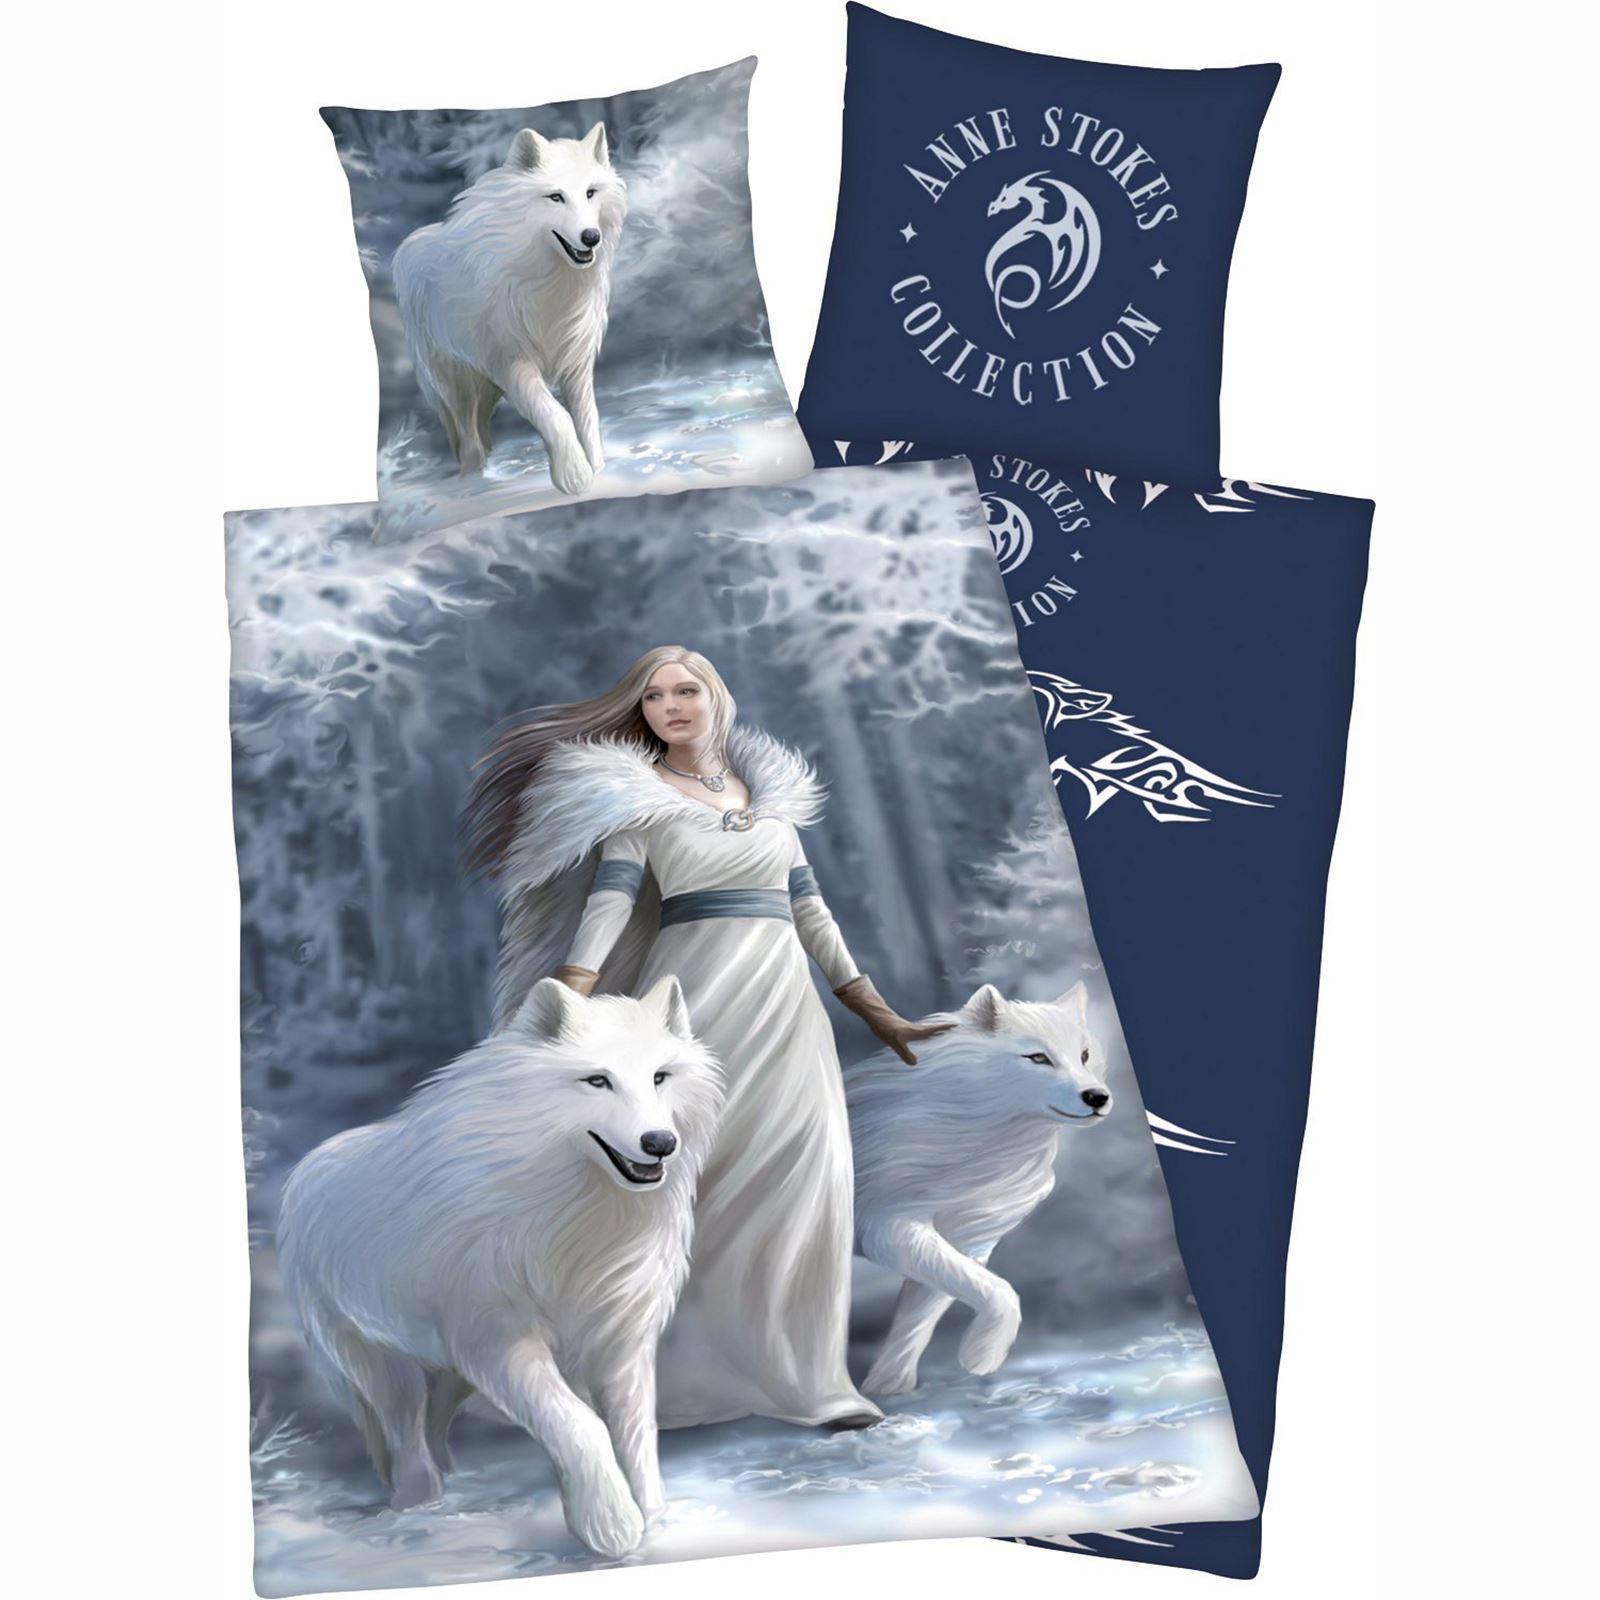 Anne Stokes Snow Queen Wolves Single Duvet Cover Set